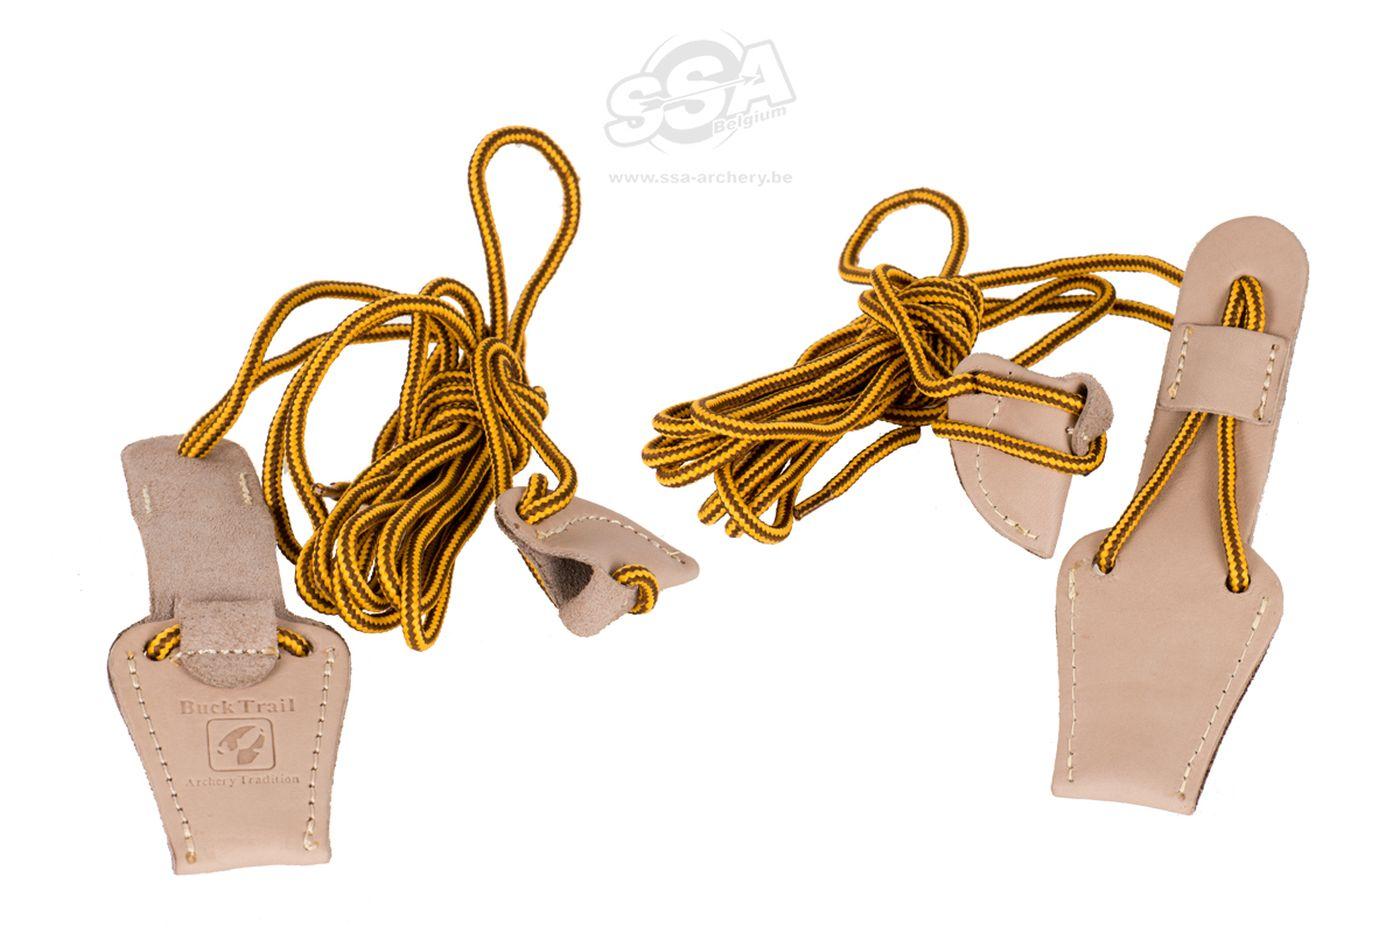 Fausse corde bucktrail 1 jpg